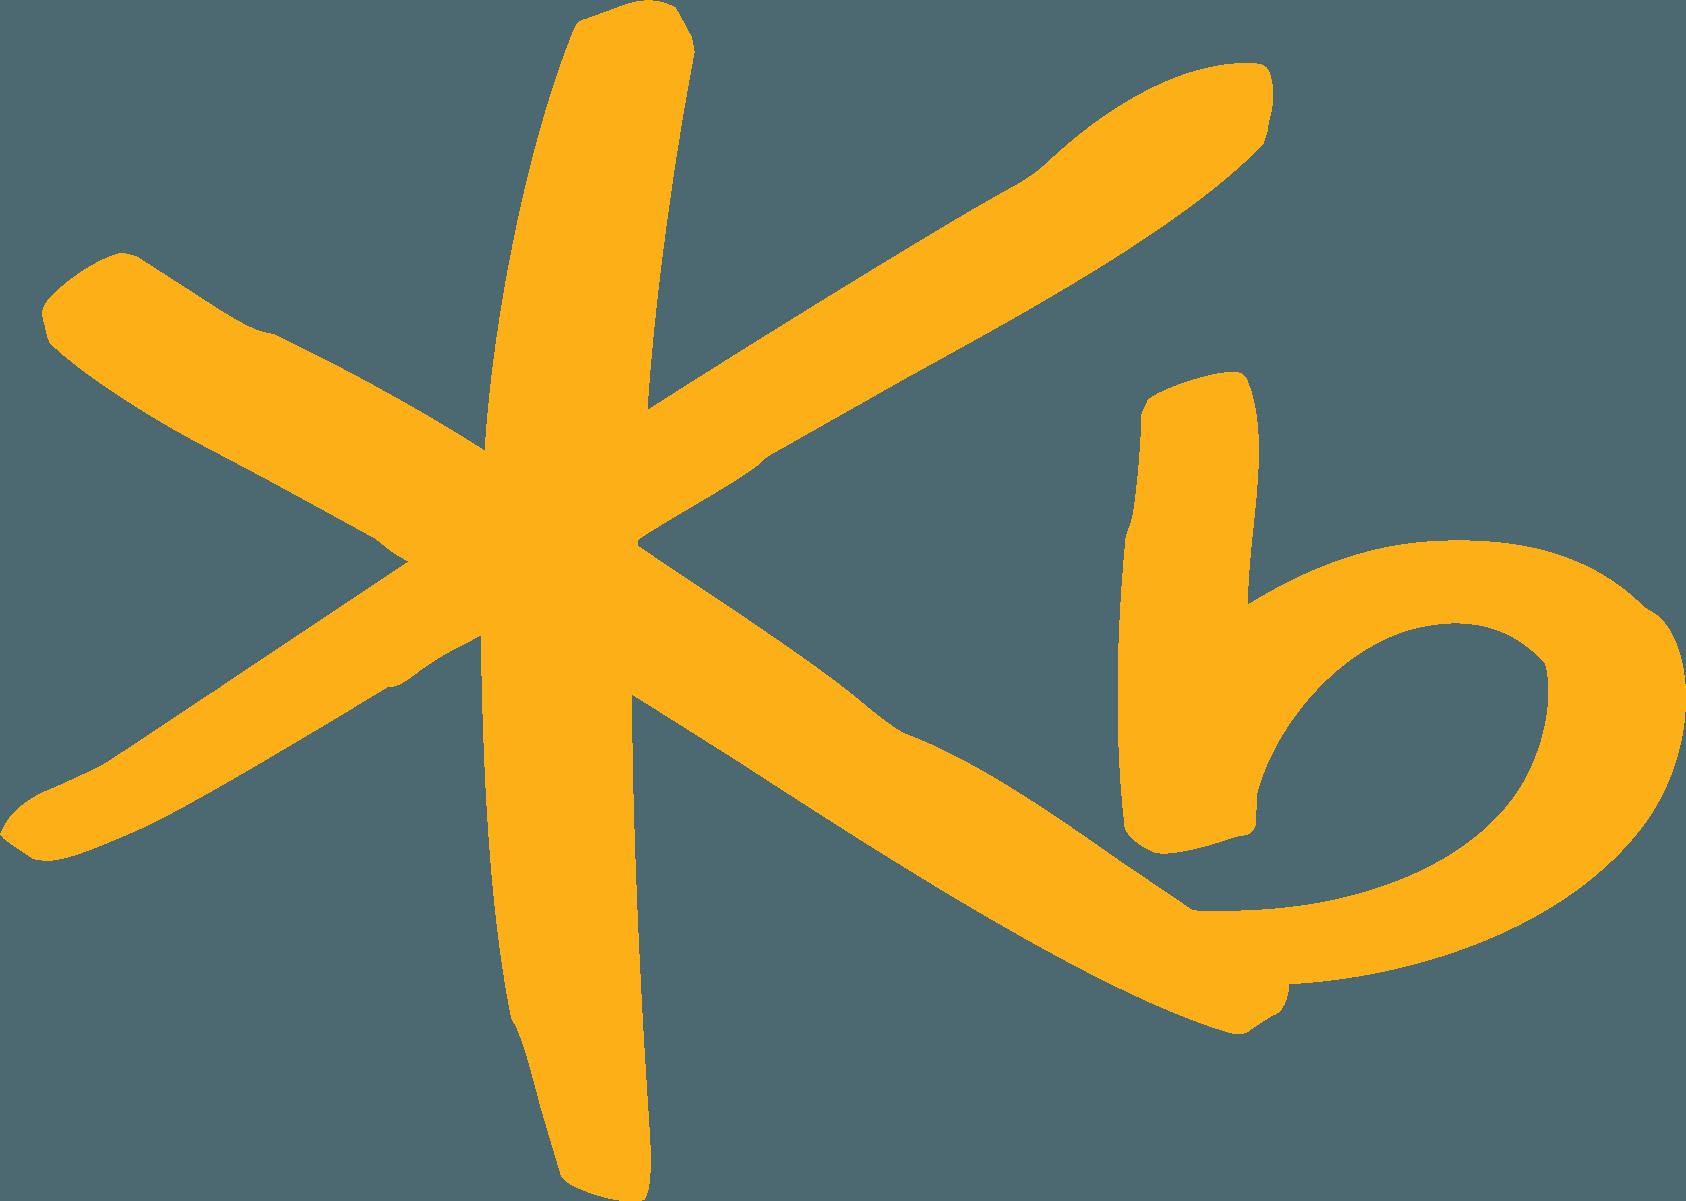 KB_SymbolMark-1